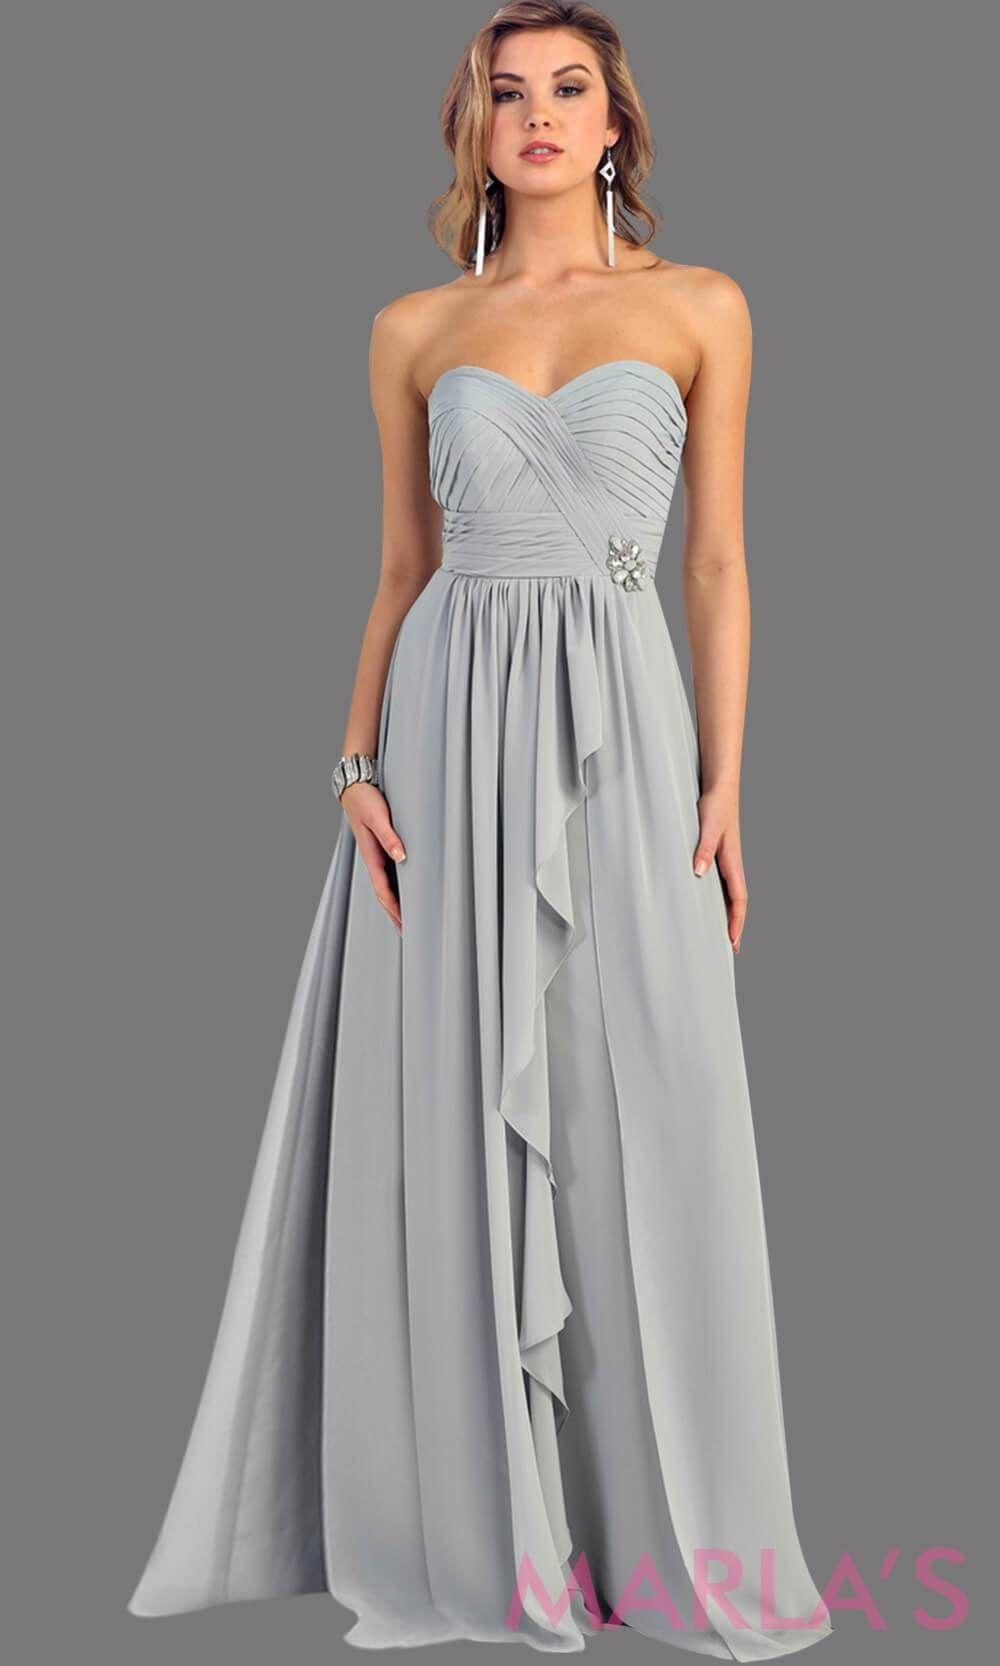 Pin On Dresses [ 1666 x 1000 Pixel ]